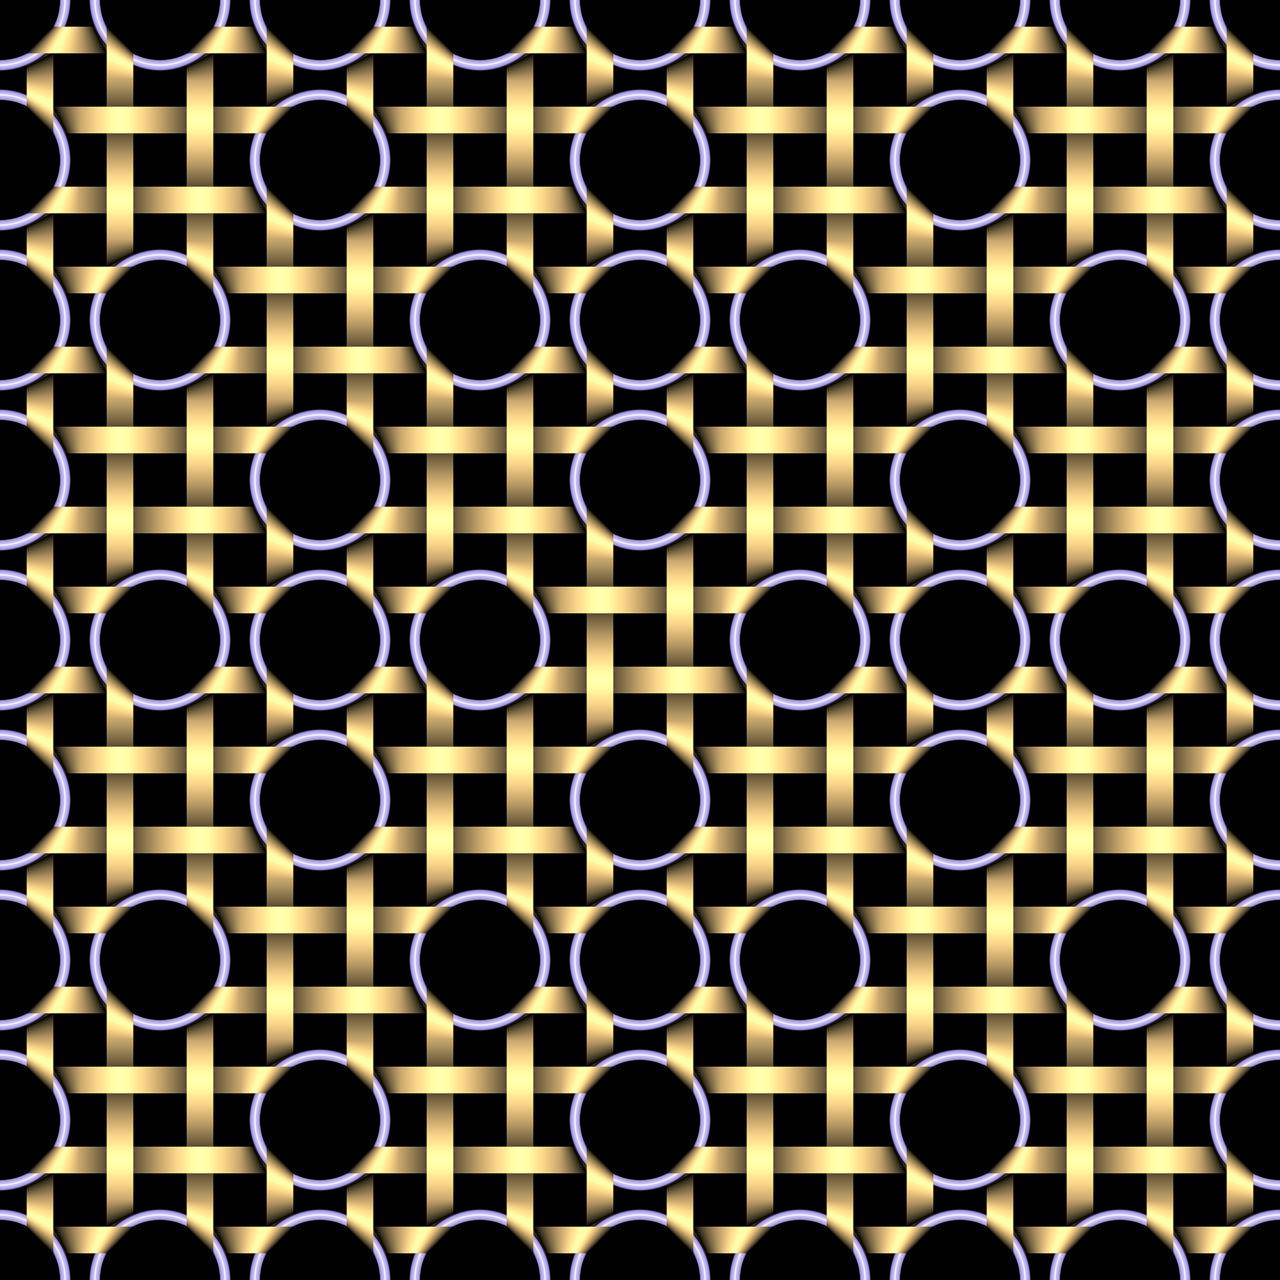 Sierpinski weave rings by markdow